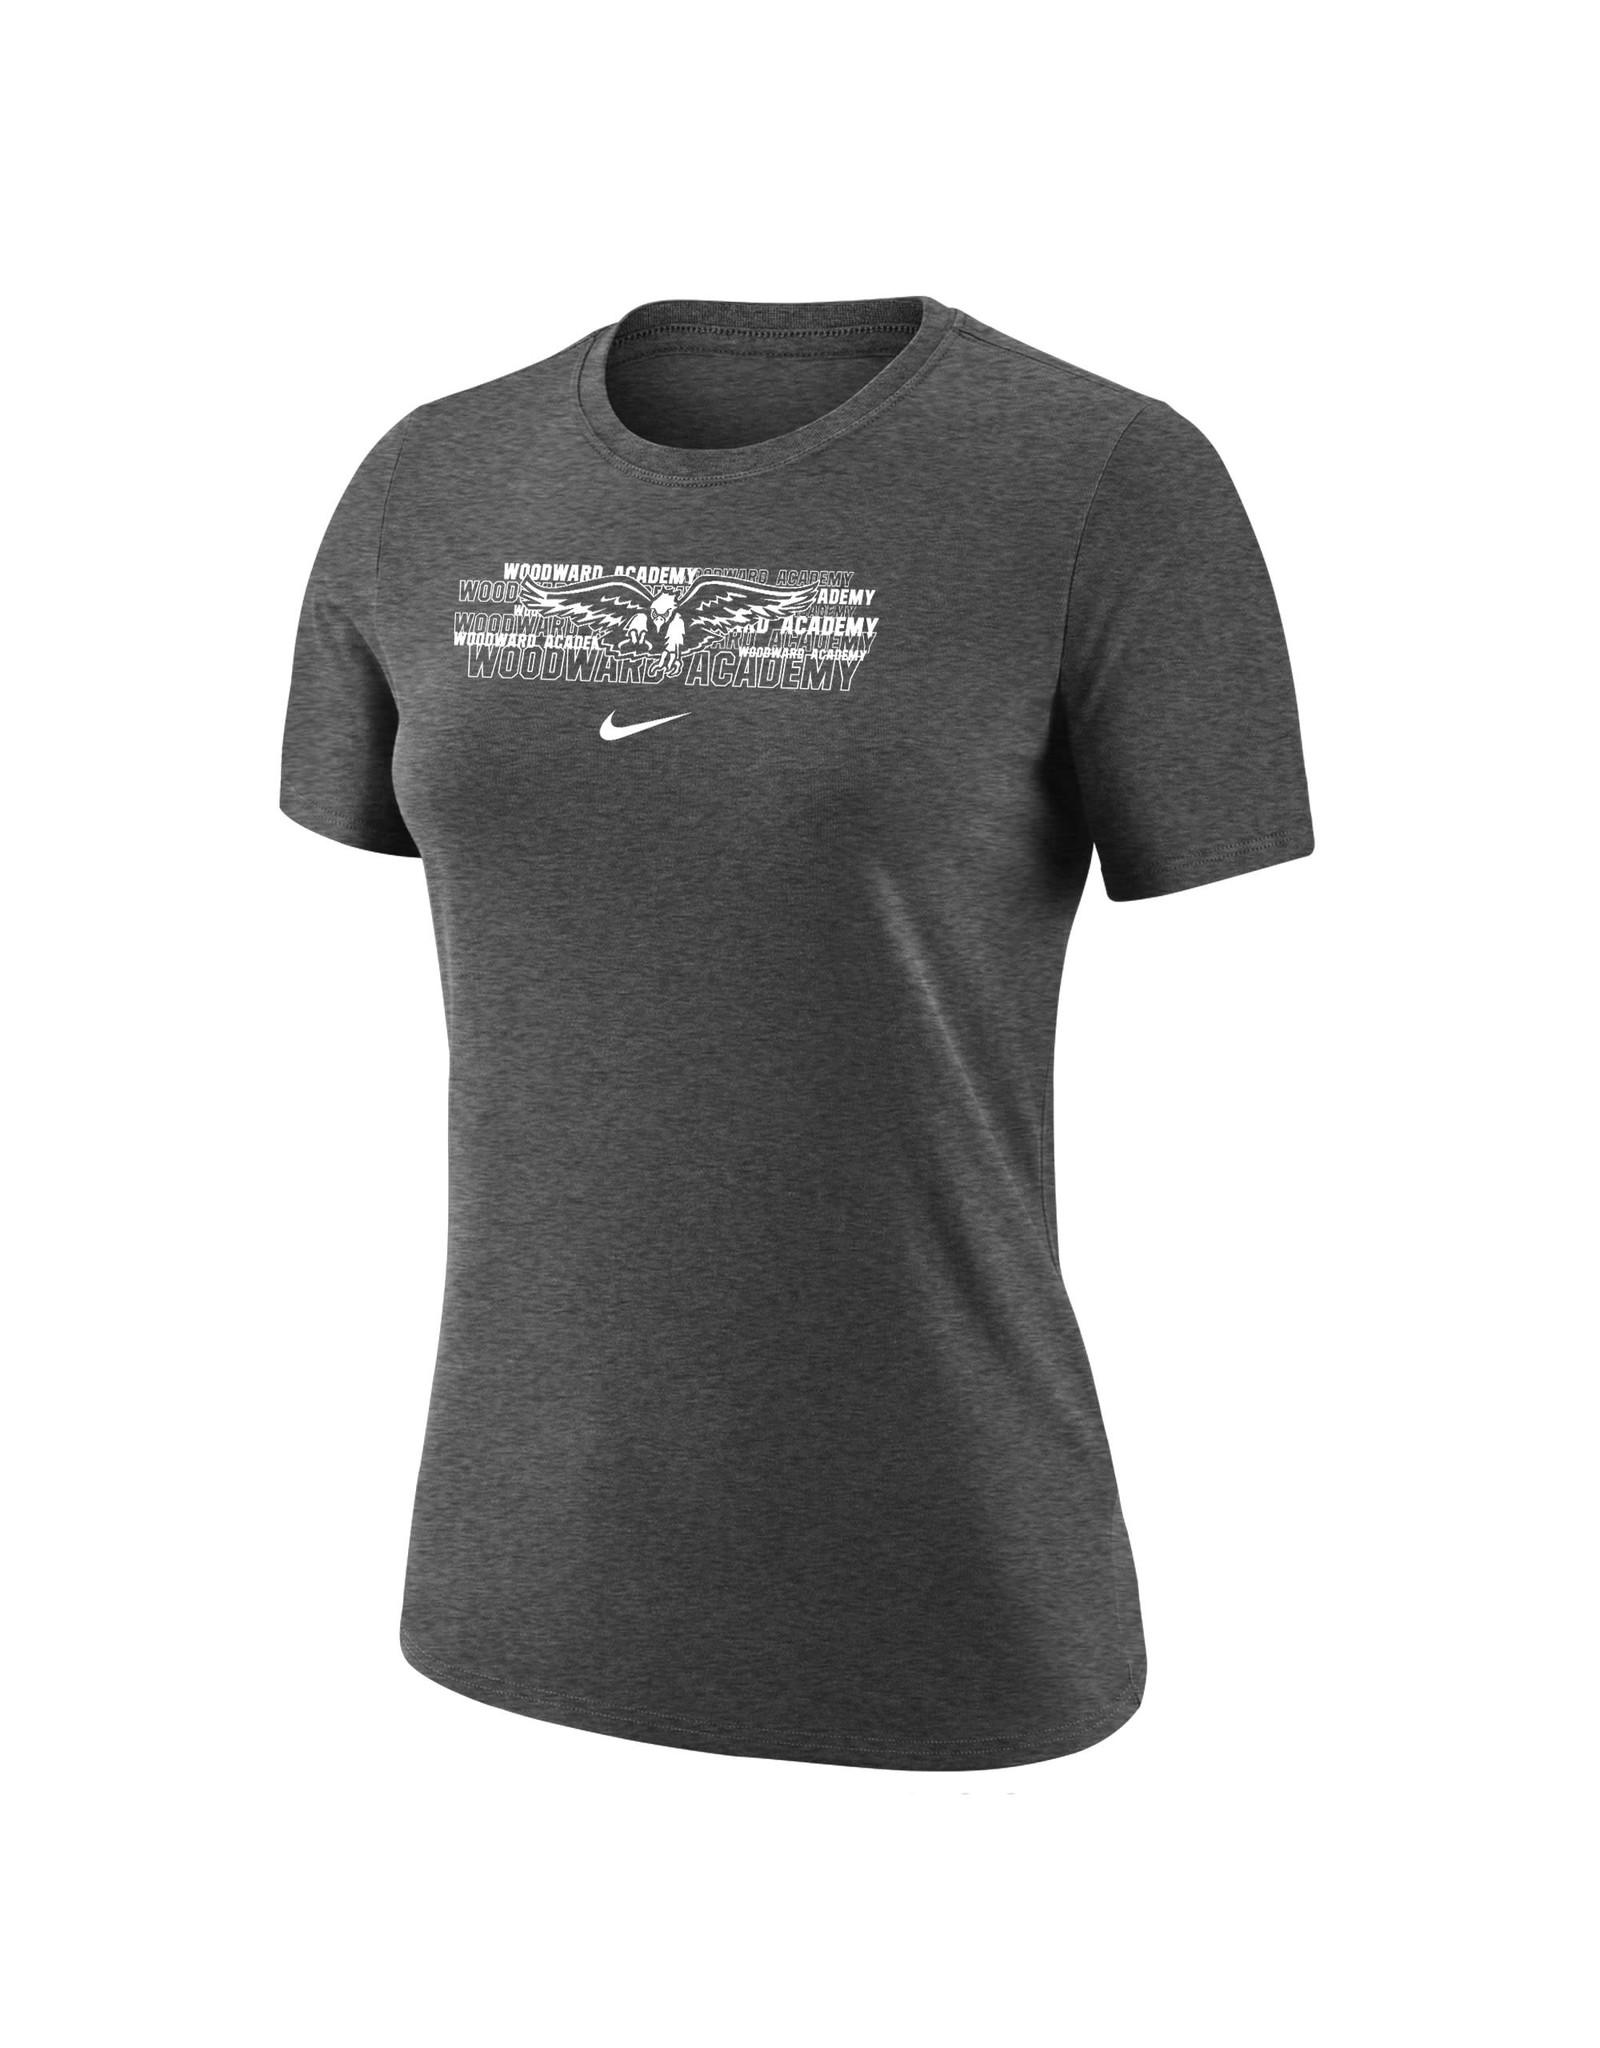 NIKE Ladies Dri-Fit Cotton SS T Shirt in Dark Heather